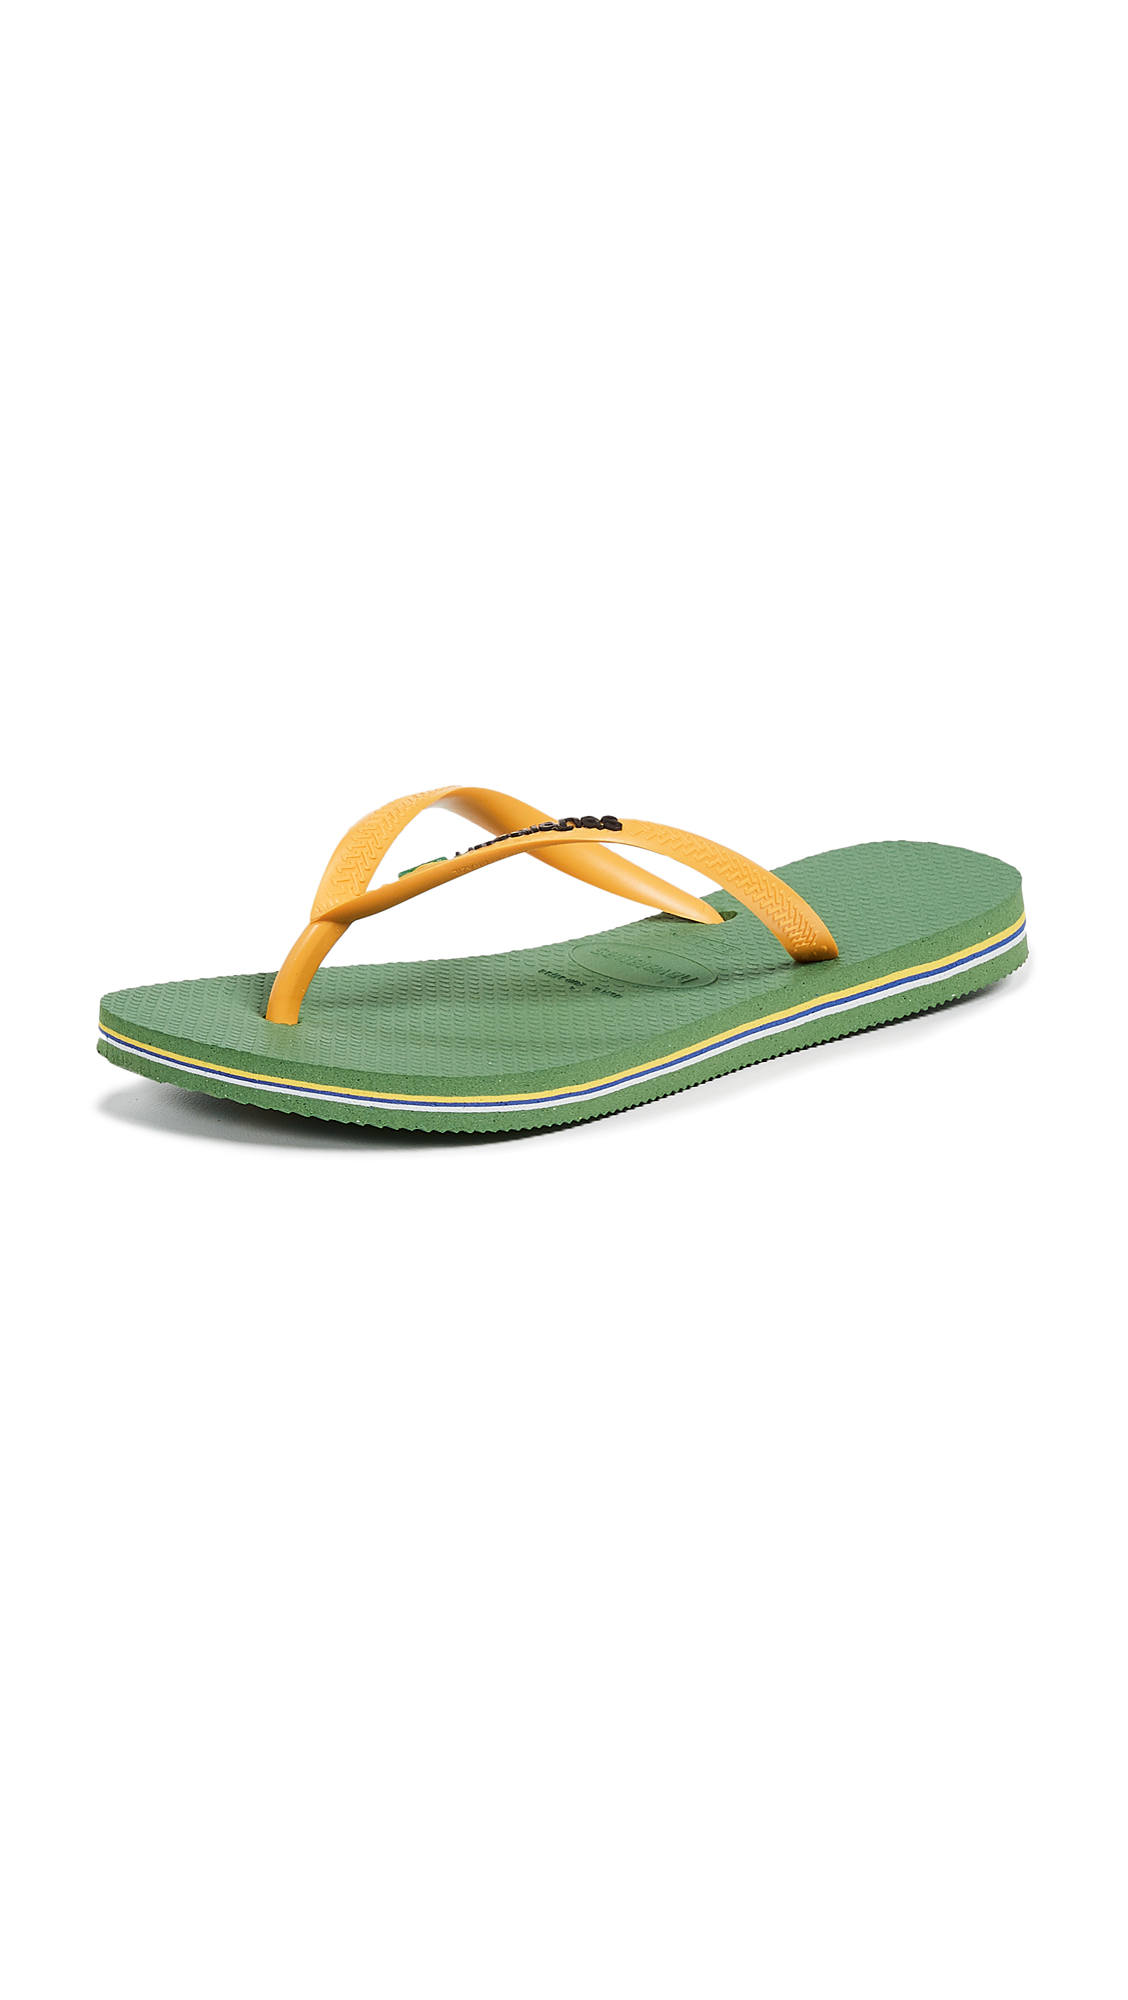 Havaianas Slim Brazil Flip Flops - Green Bamboo